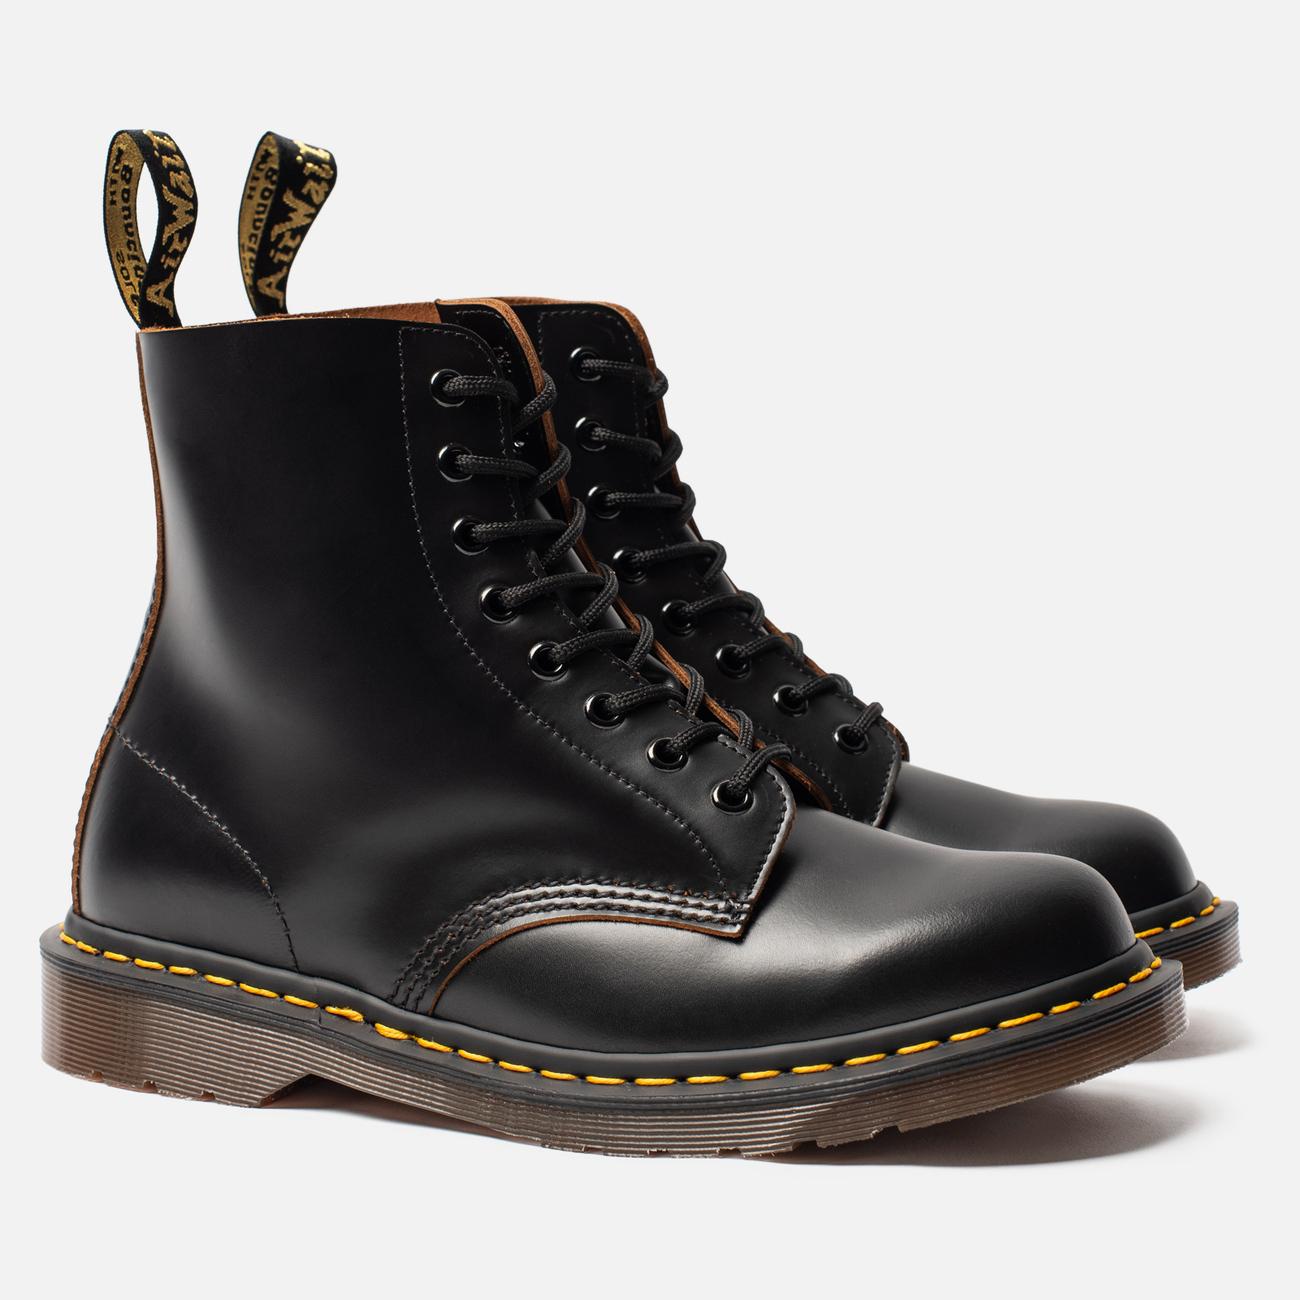 Мужские ботинки Dr. Martens 1460 Vintage Quillon Black